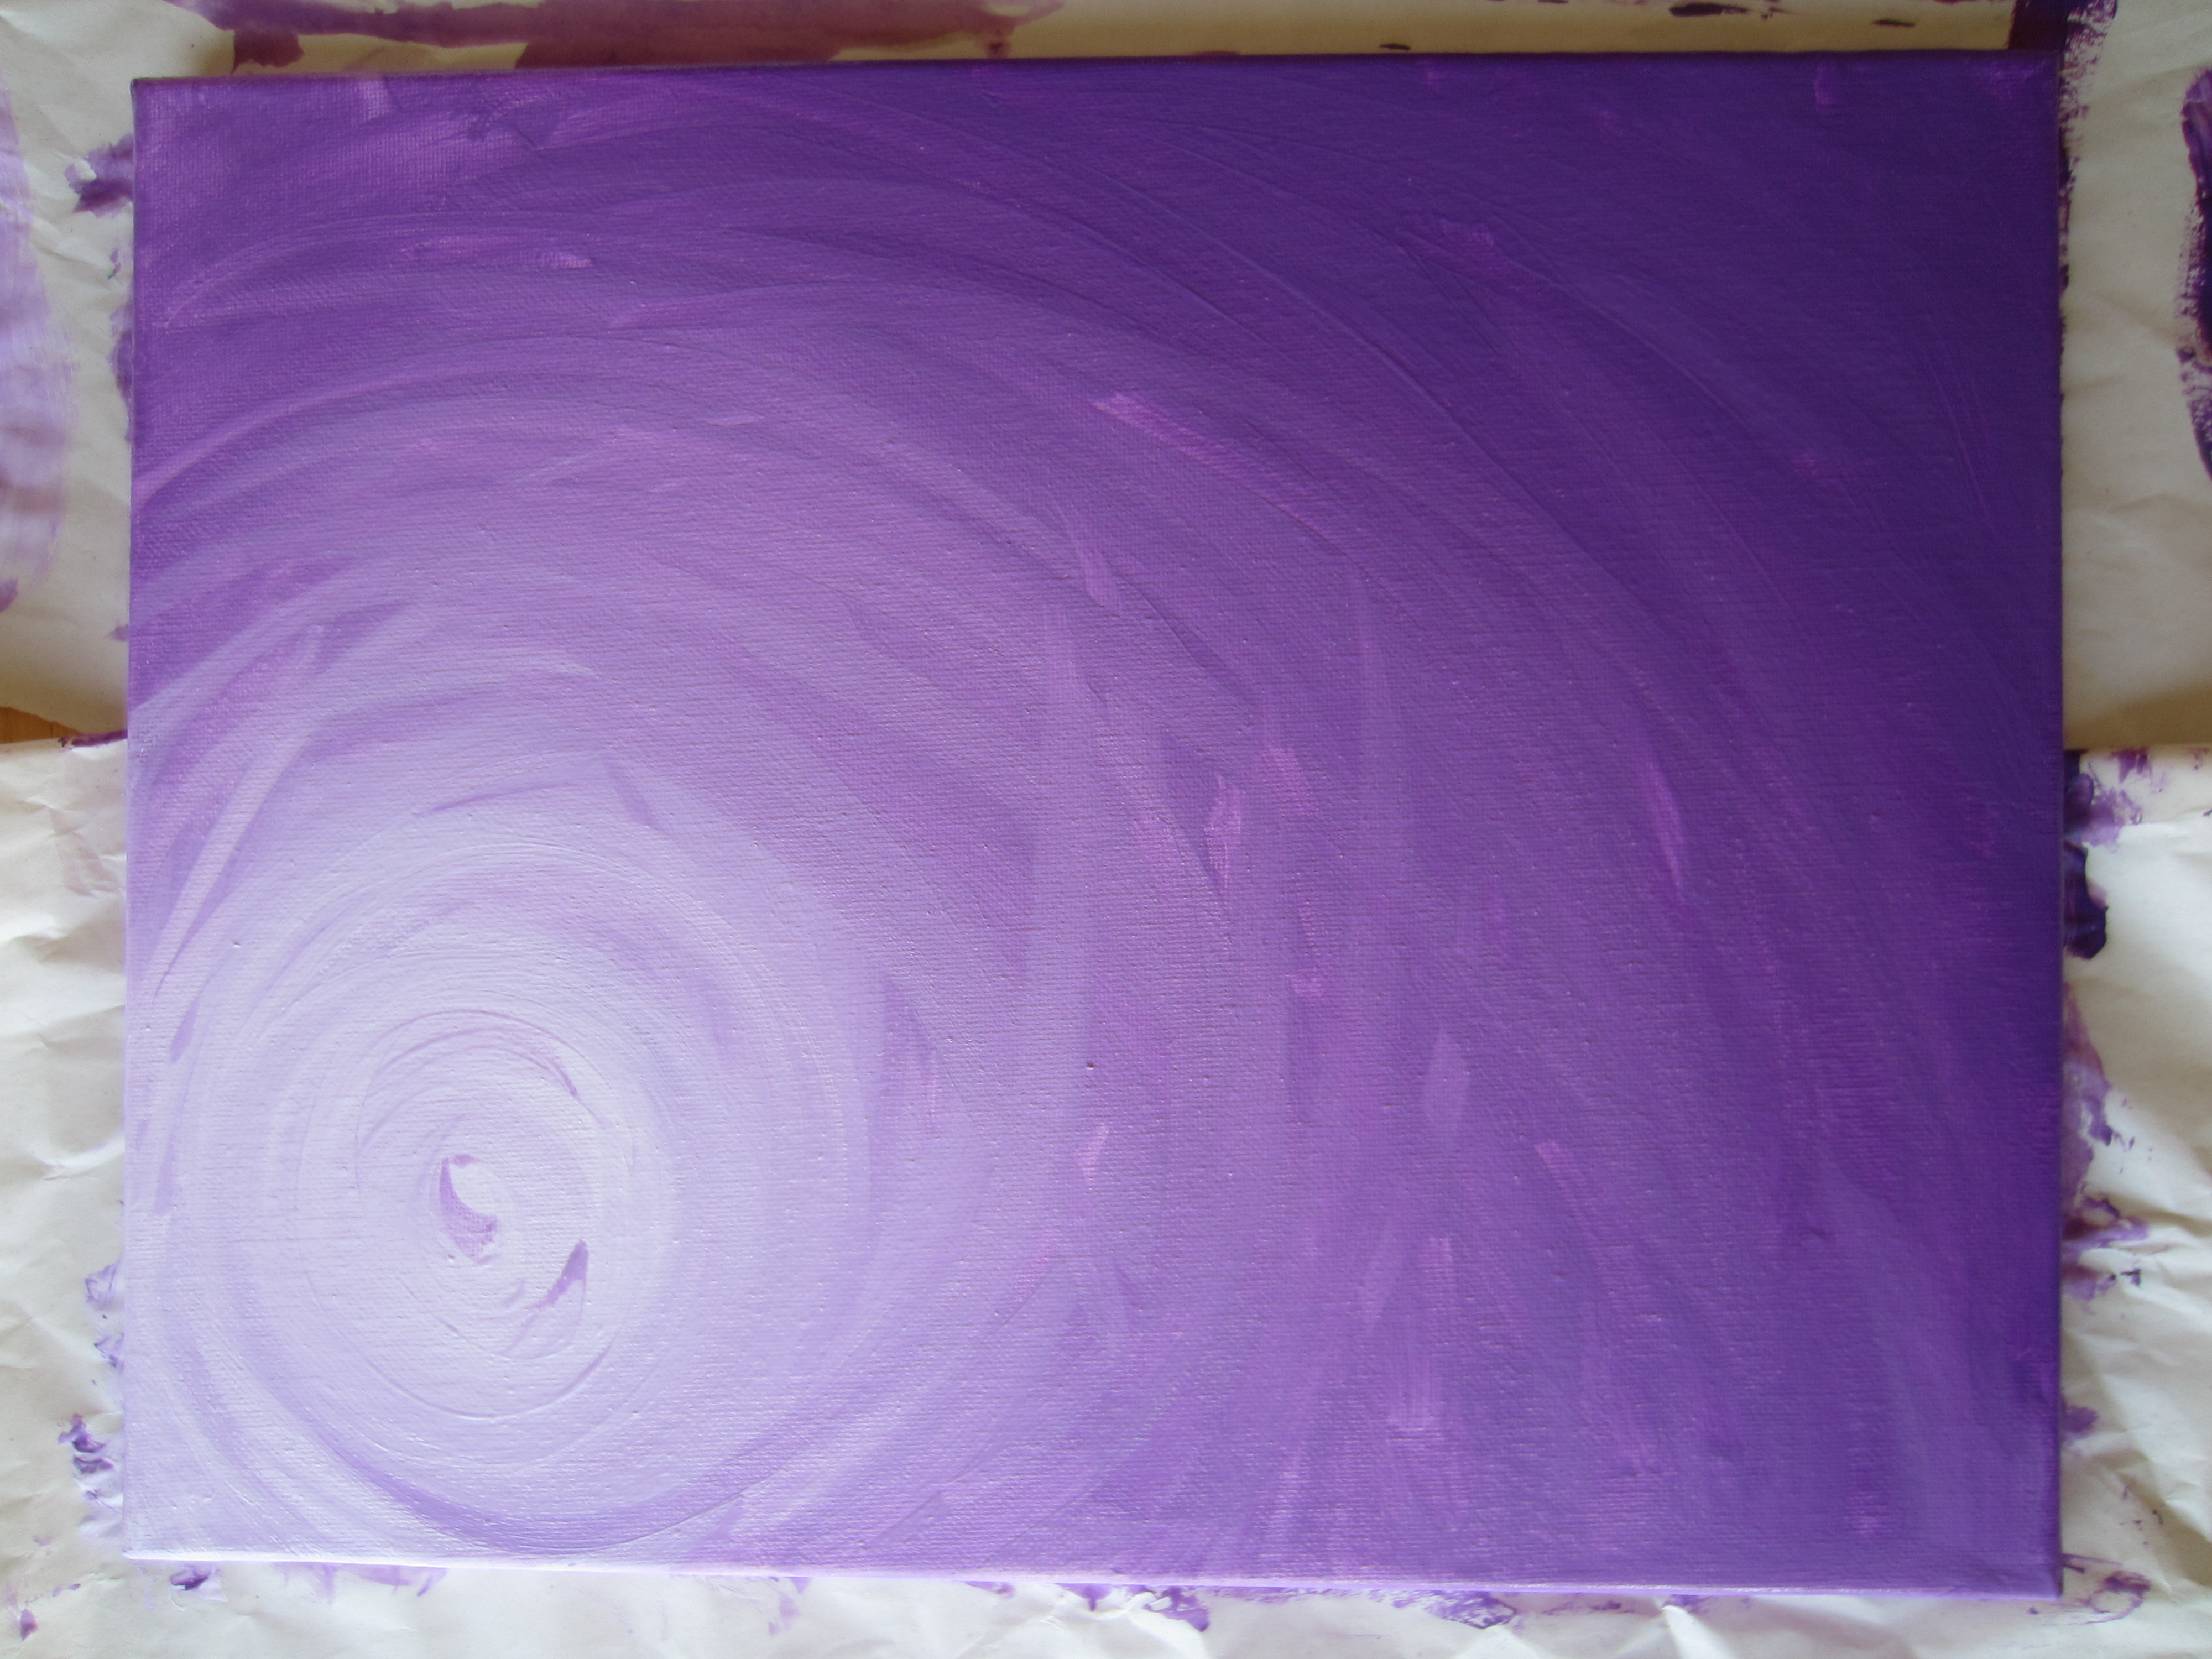 Blending Oil Paint On Canvas